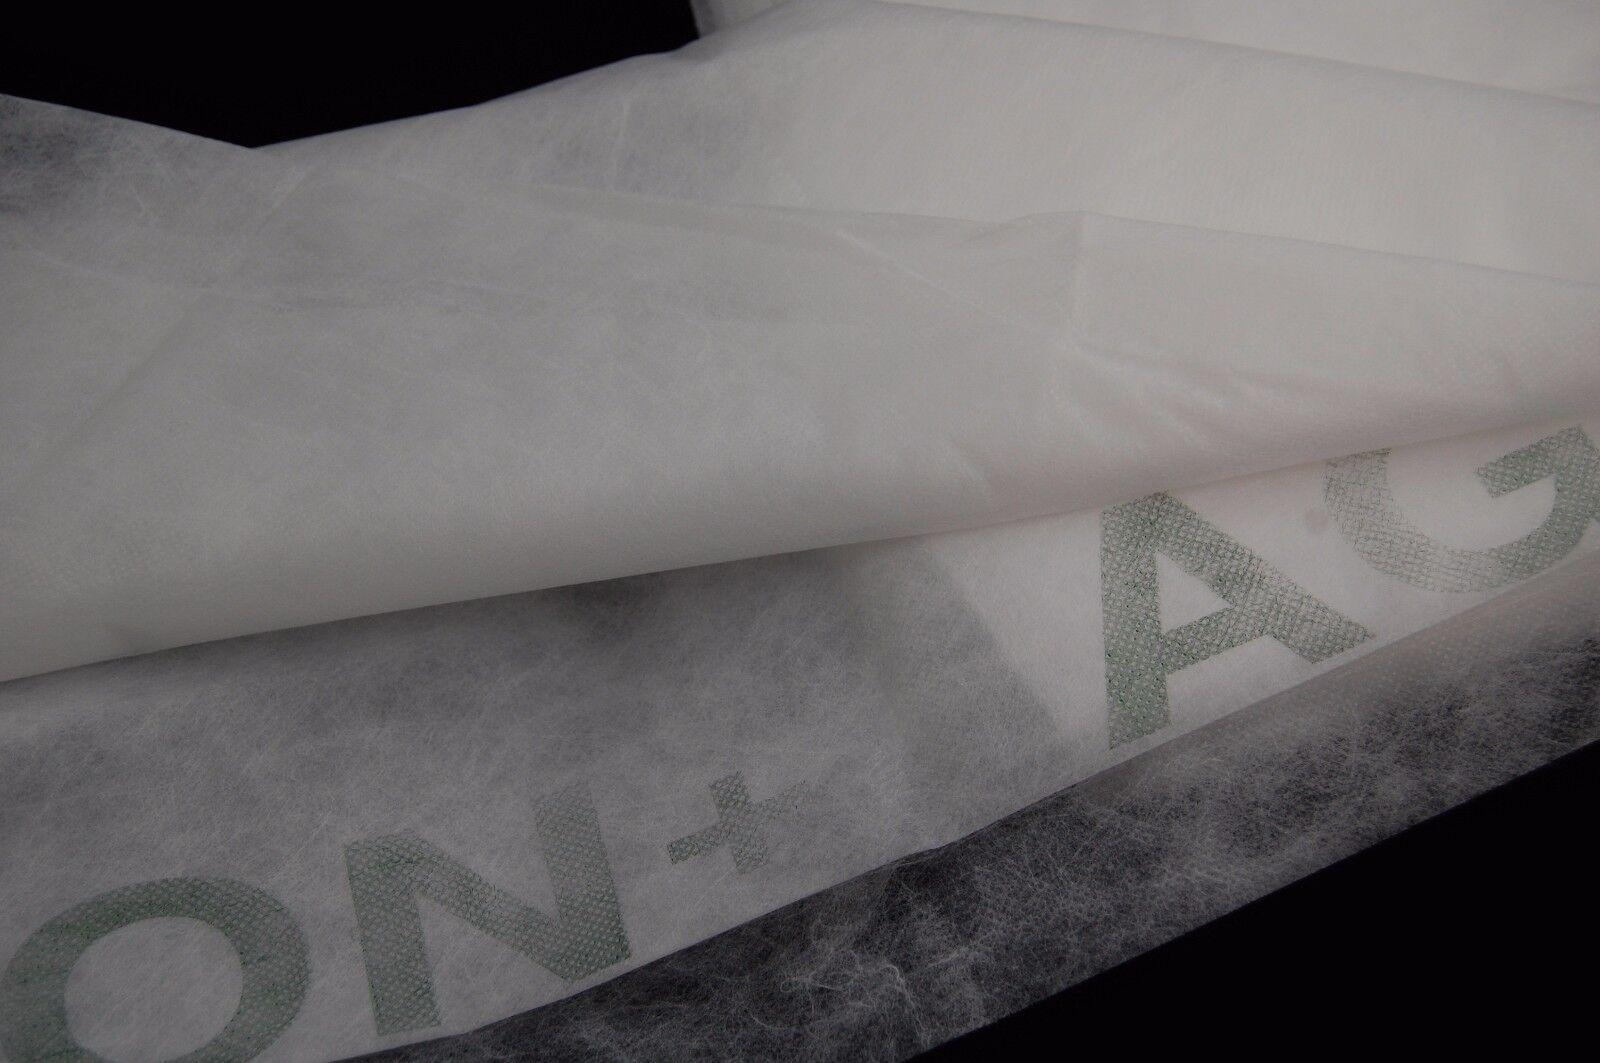 Agribon AG-19 Floating Plant Cover/Frost Blanket /Garden Fabric- 83